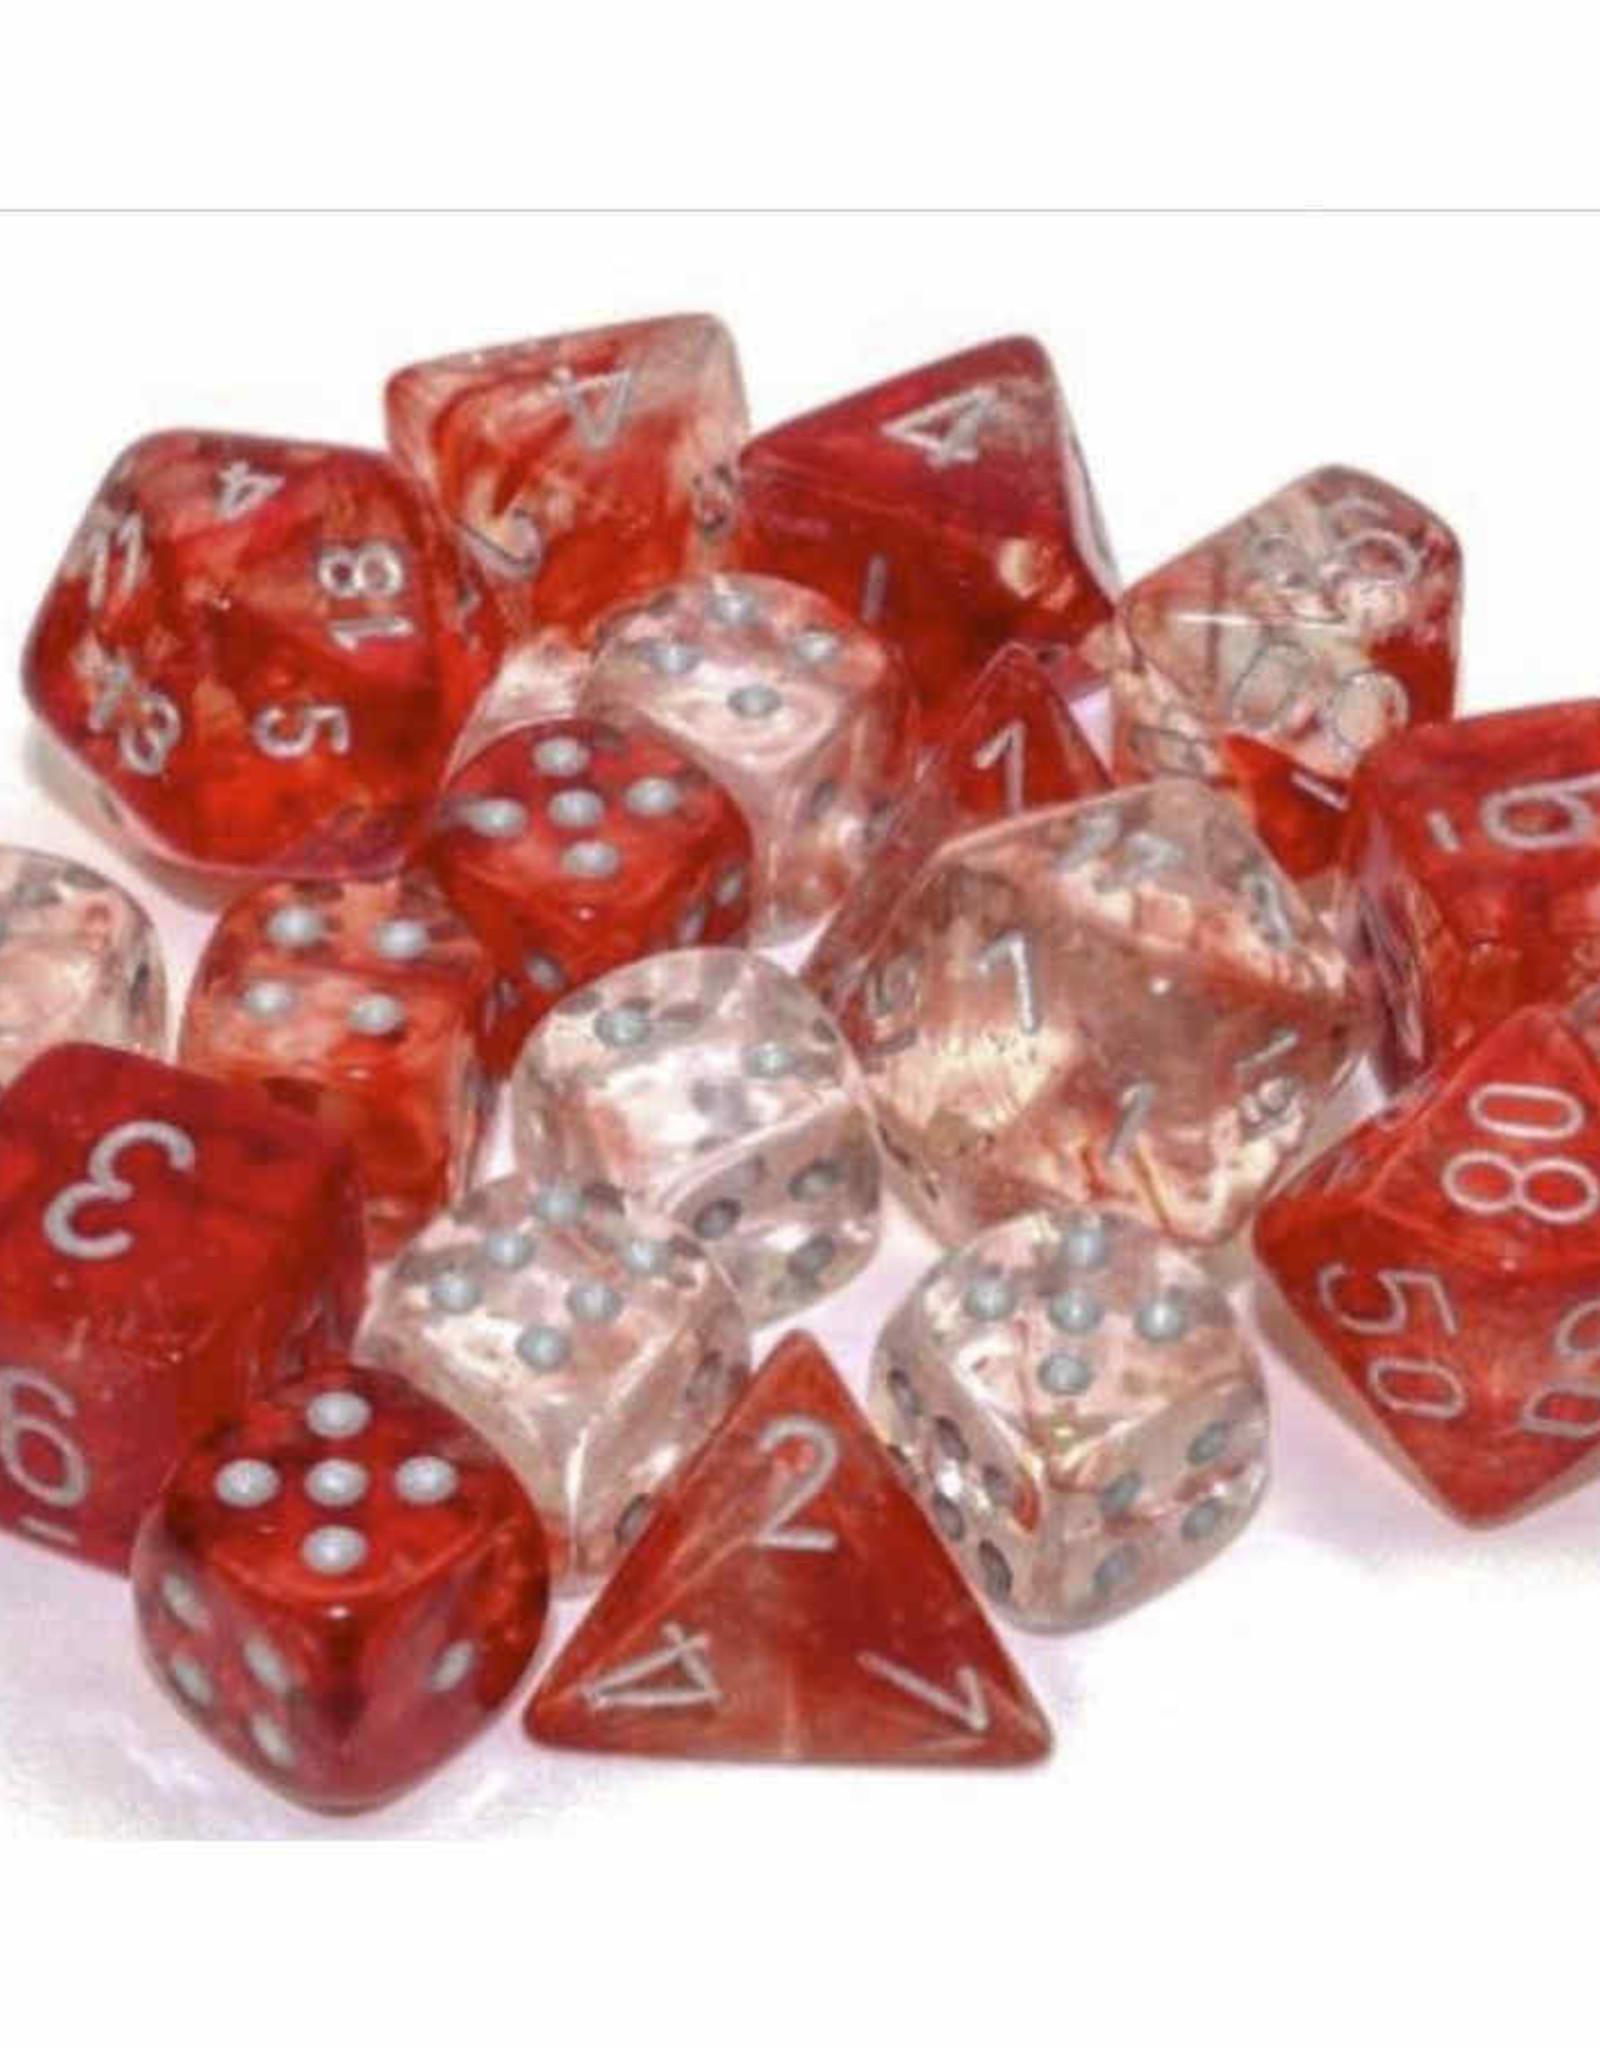 Chessex 12mm 36ct D6 Block: Nebula Luminary: Red w/Silver